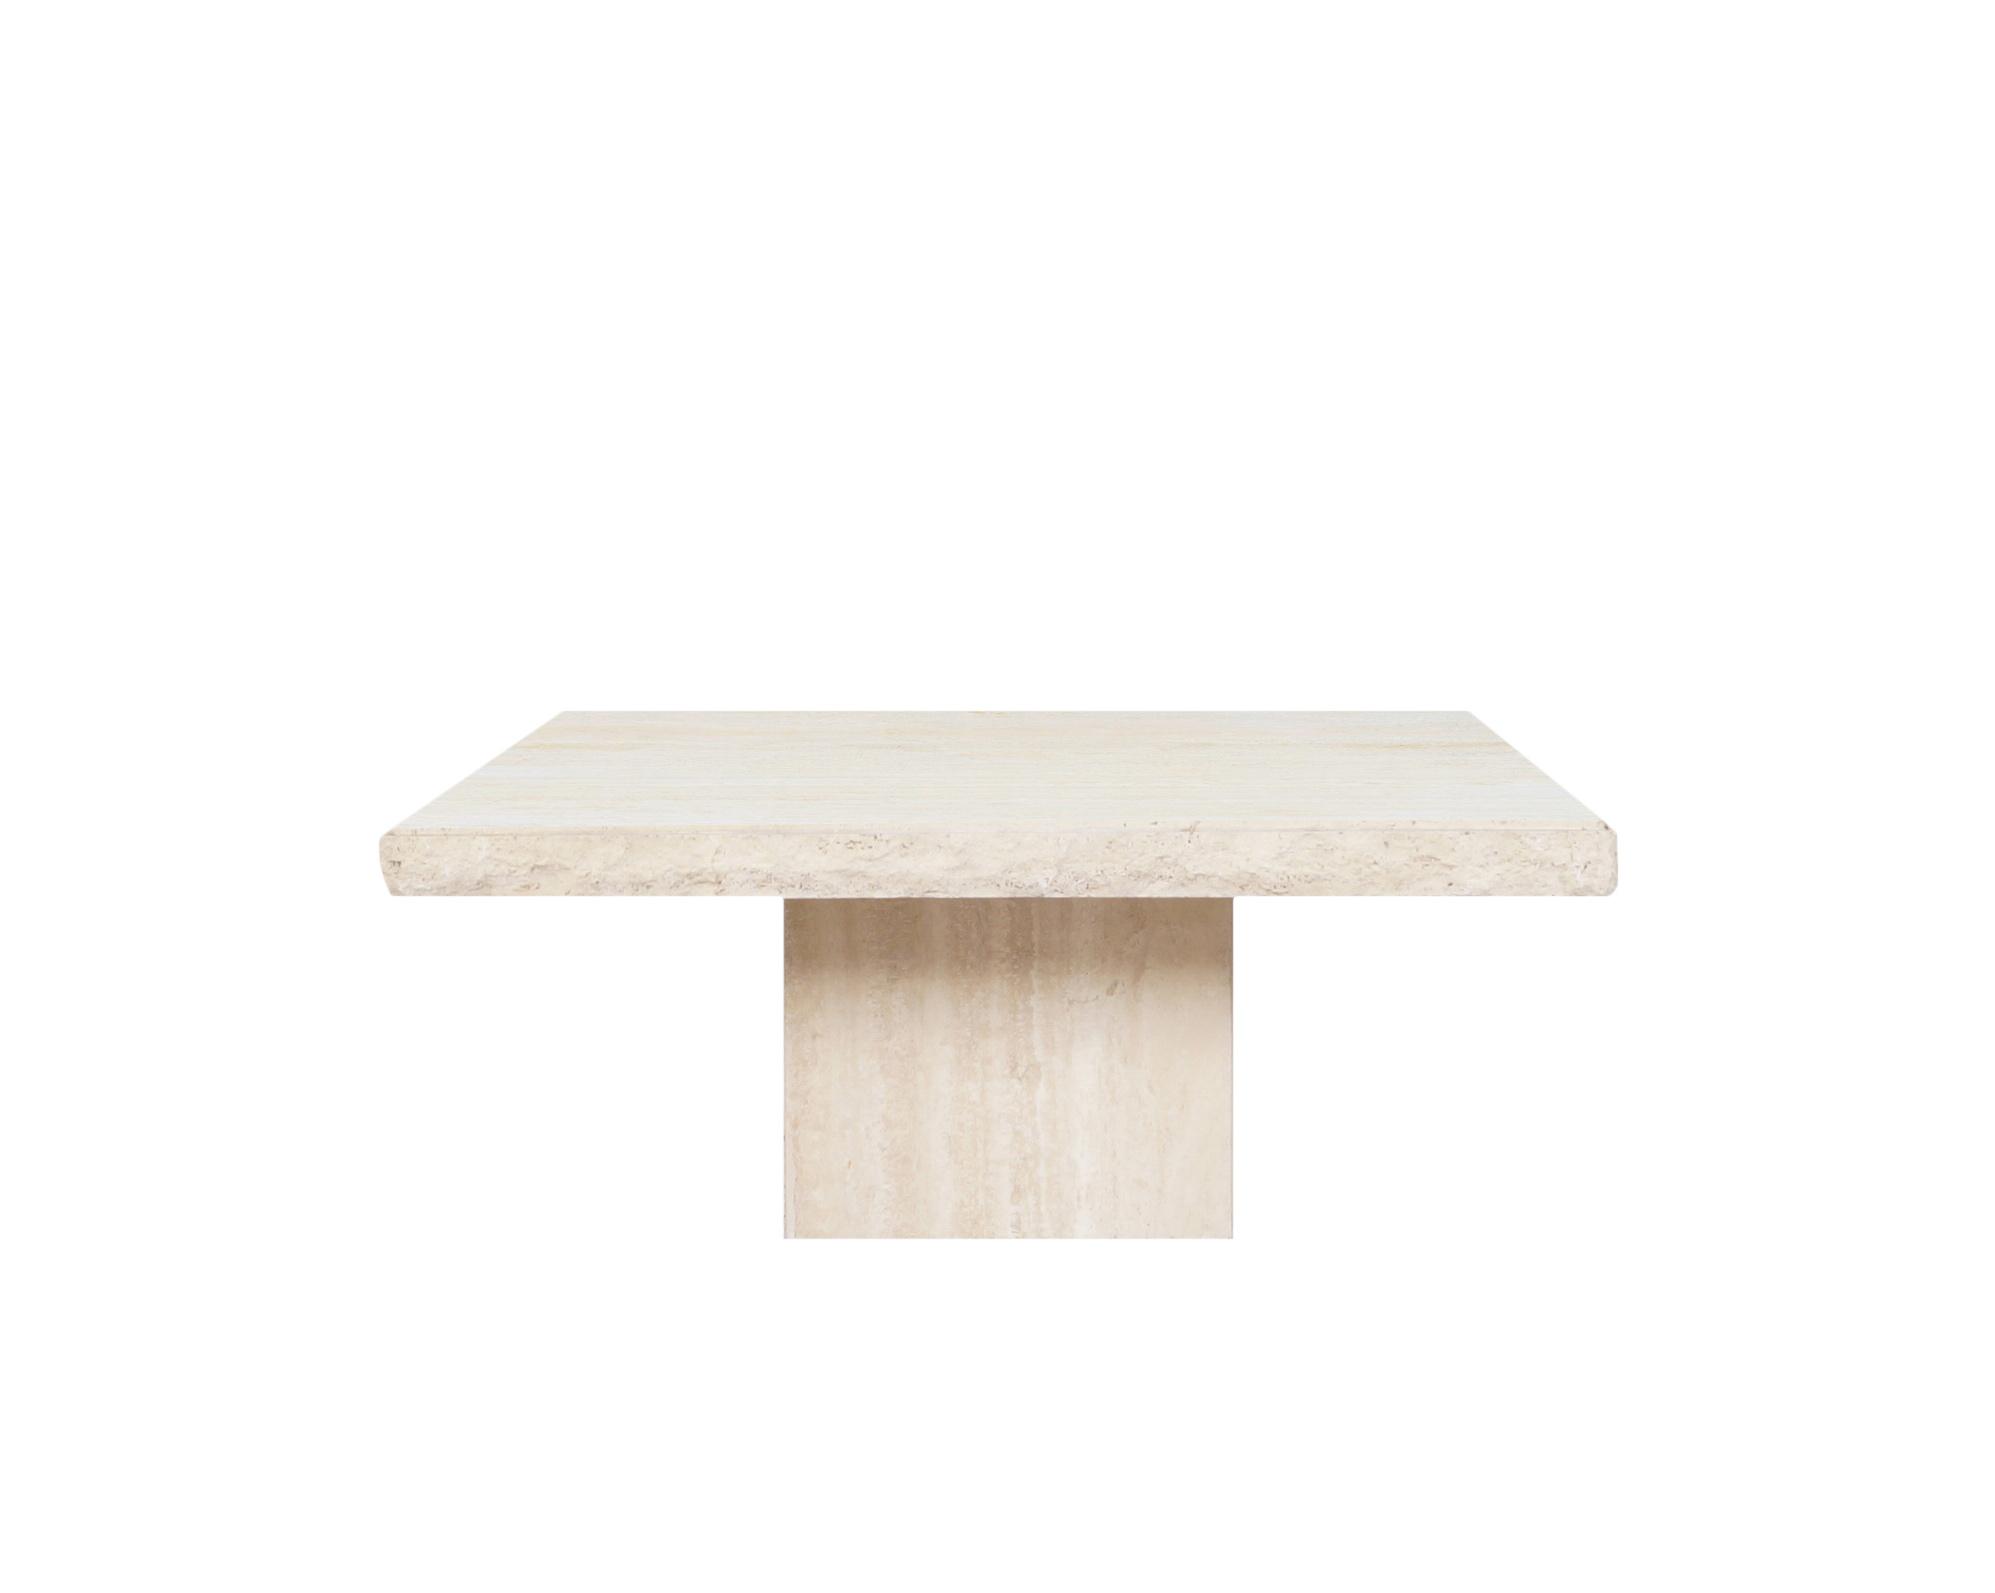 Italian Modernist Live Edge Travertine Coffee Table